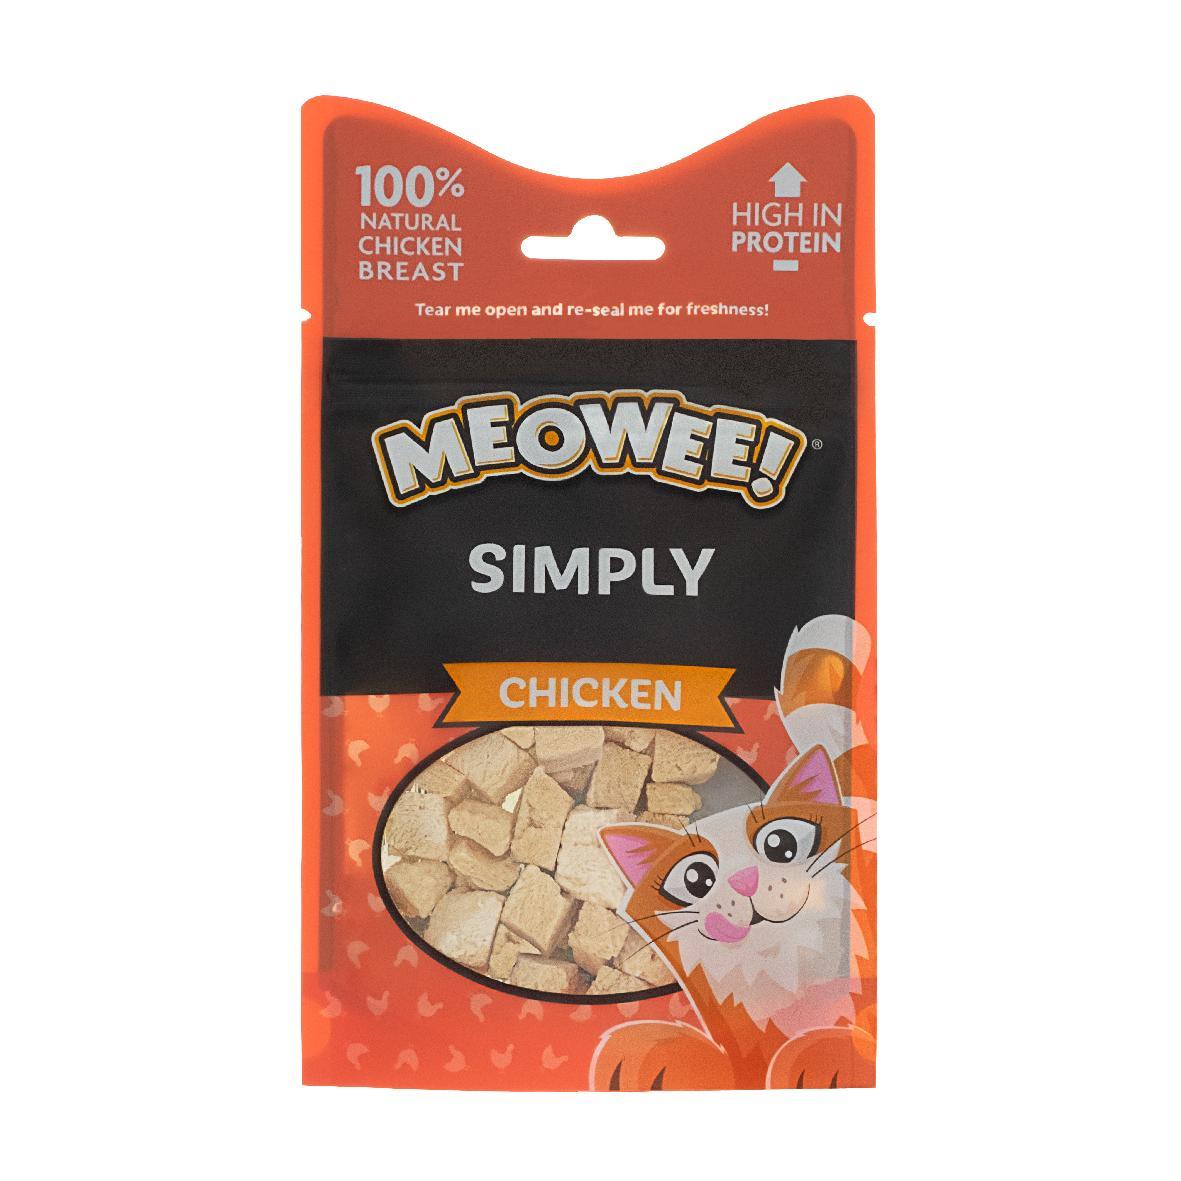 Meowee Simply Chicken Snacks 10gm (Grain/Gluten Free)